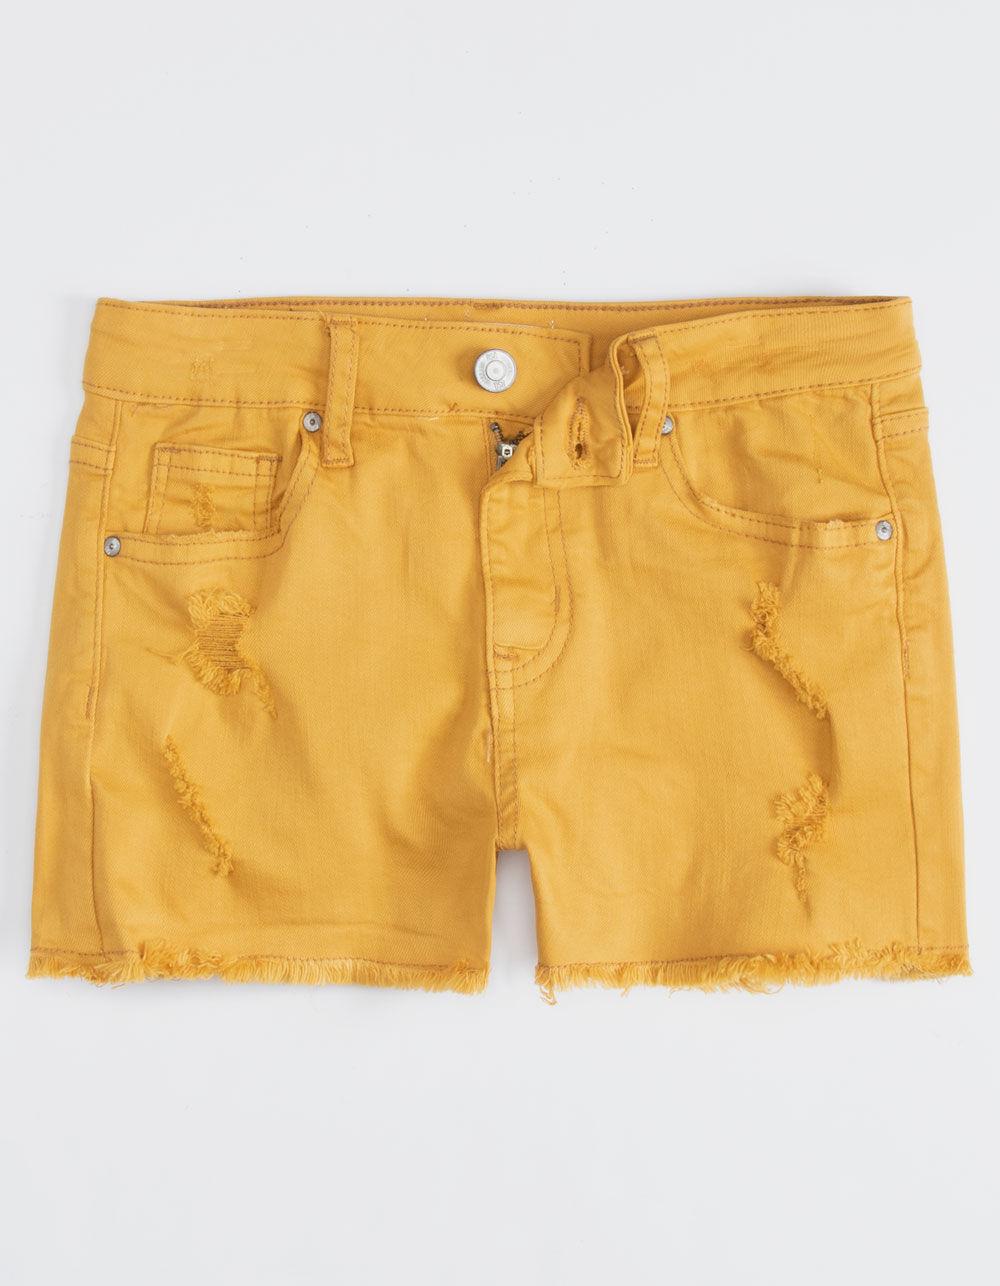 RSQ Venice Mid Rise Mustard Girls Ripped Denim Shorts